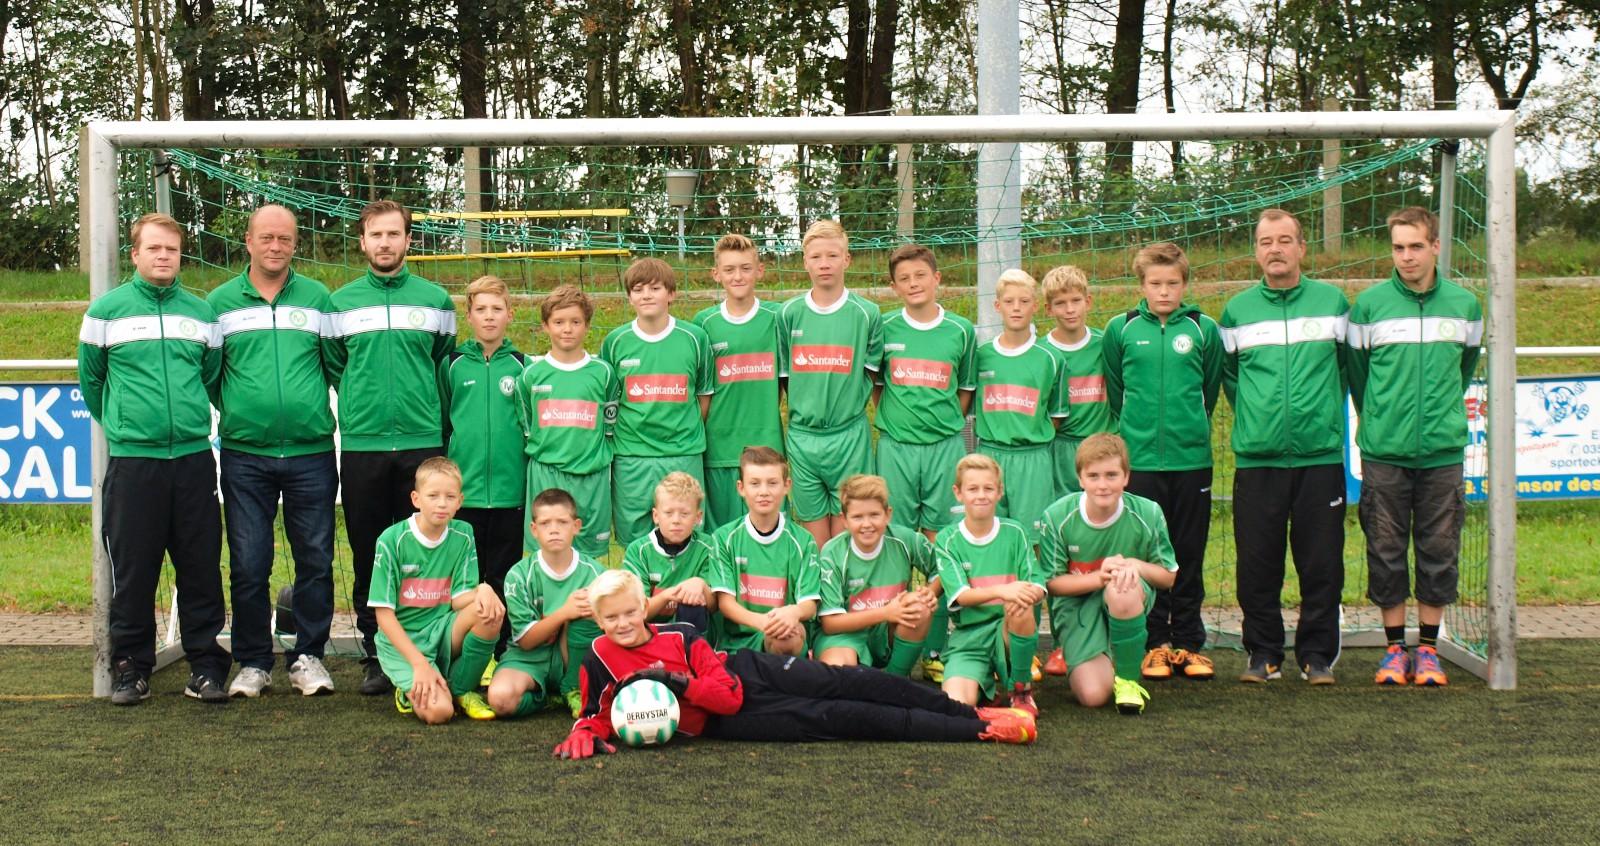 Mannschaftsfoto D-Junioren Kreisoberliga 2015